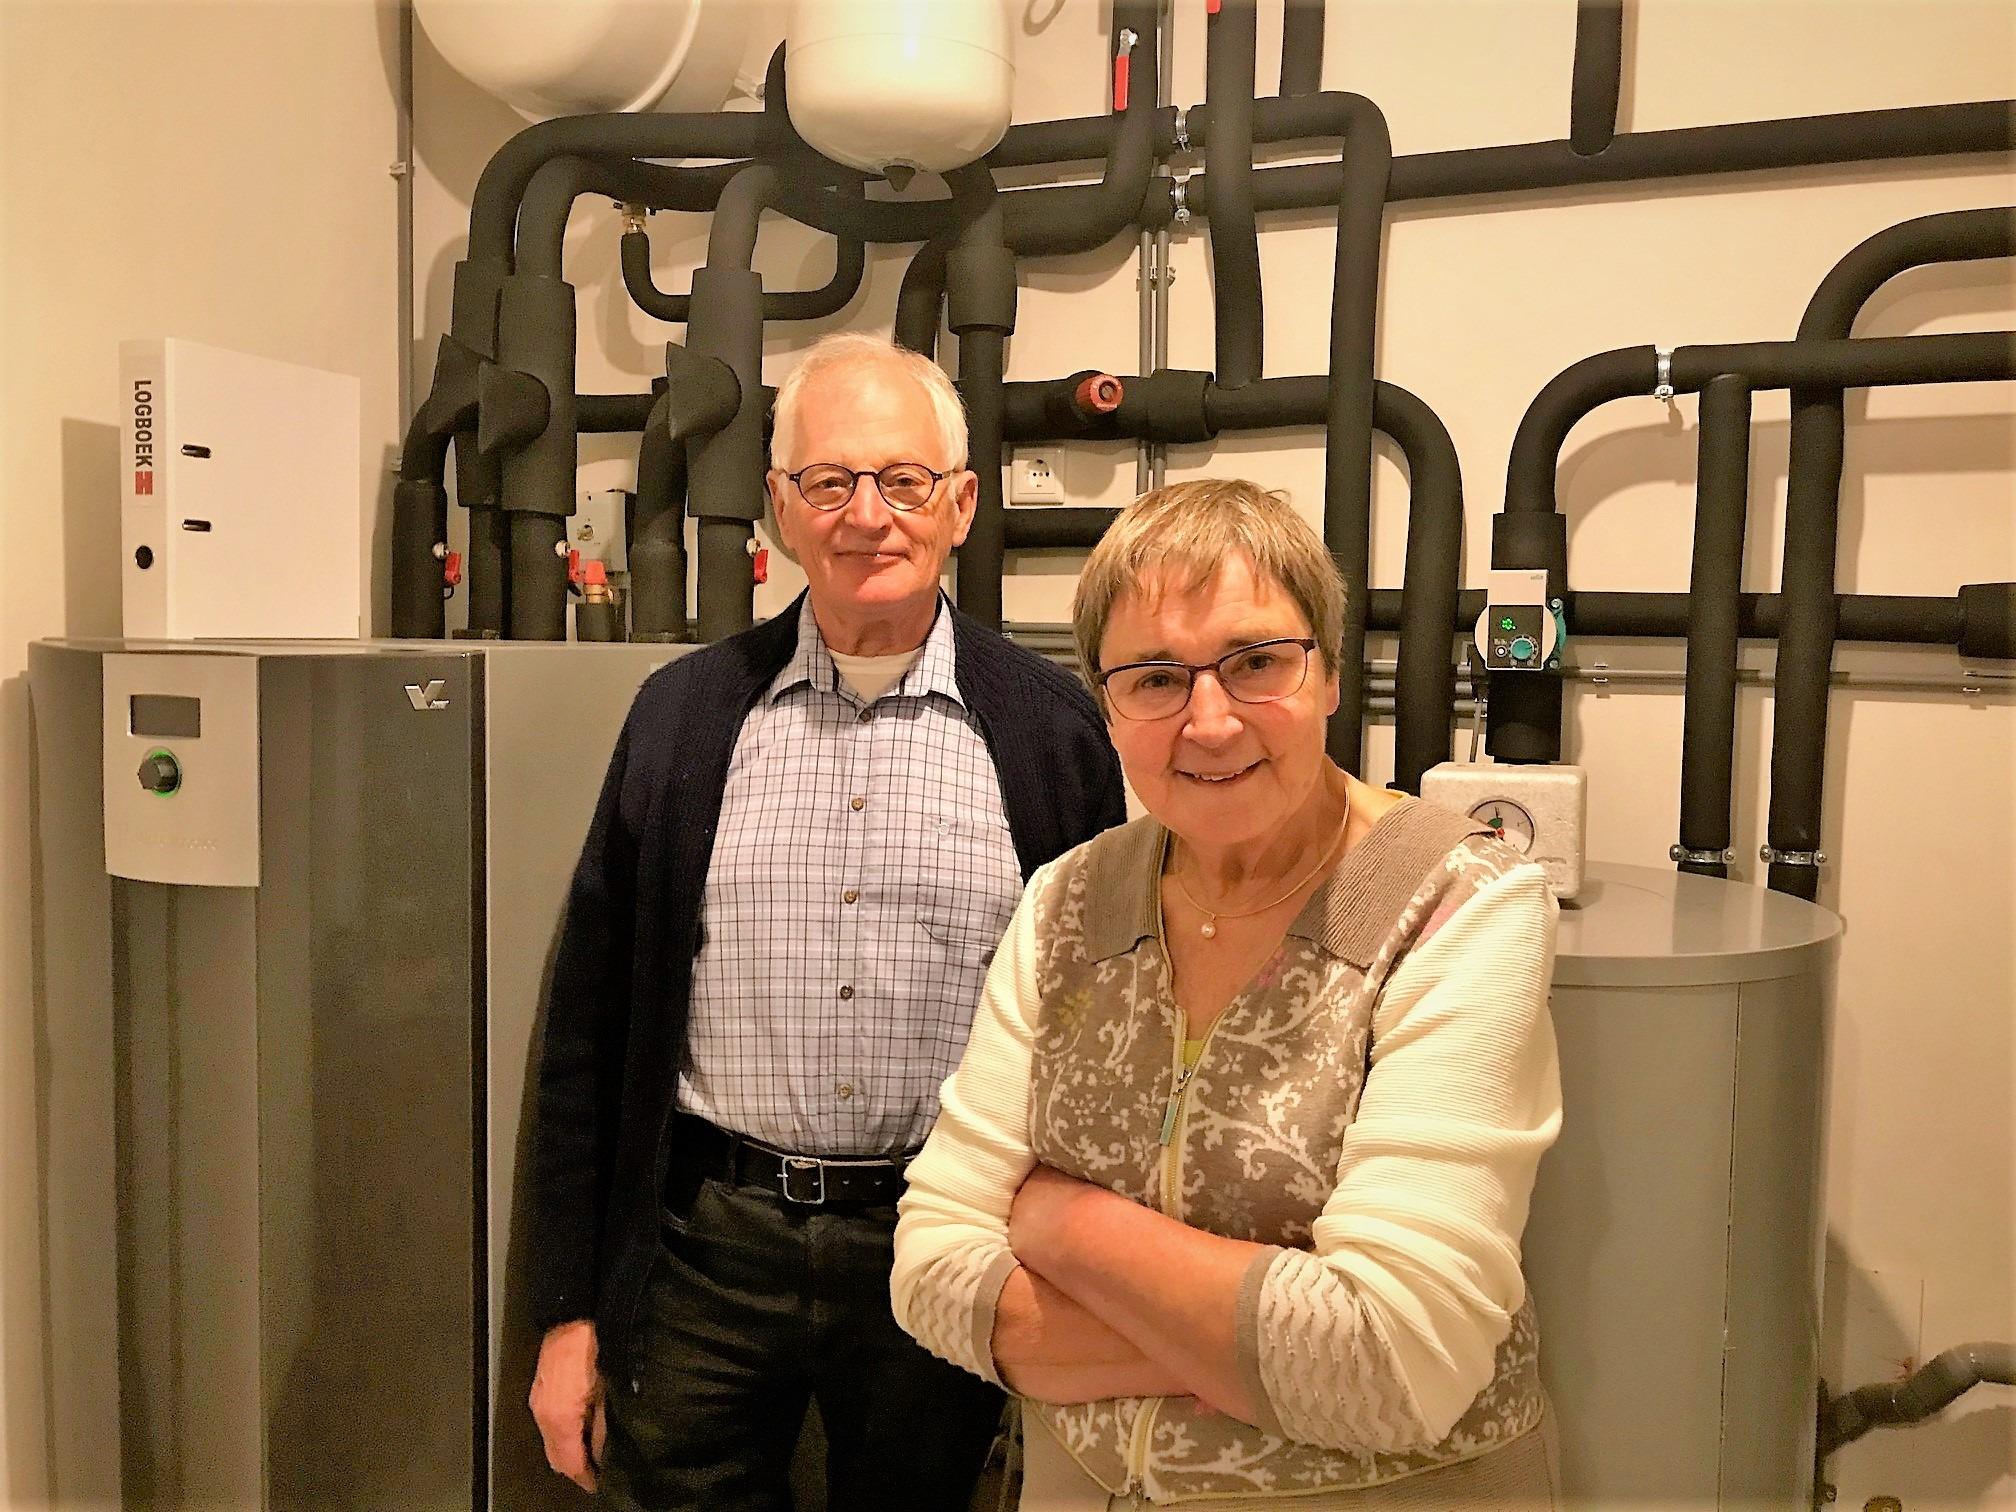 Kees en Margreet Gouwens bij de warmtepompen in hun woning